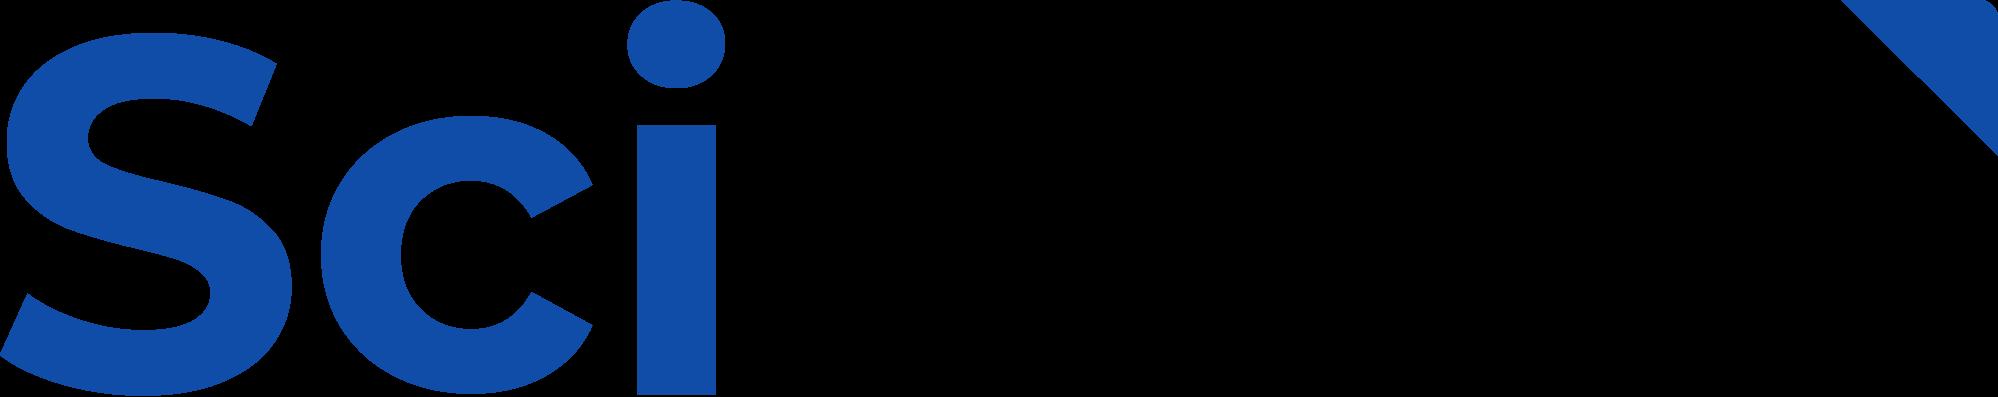 Scinote_logo_2019_black.png